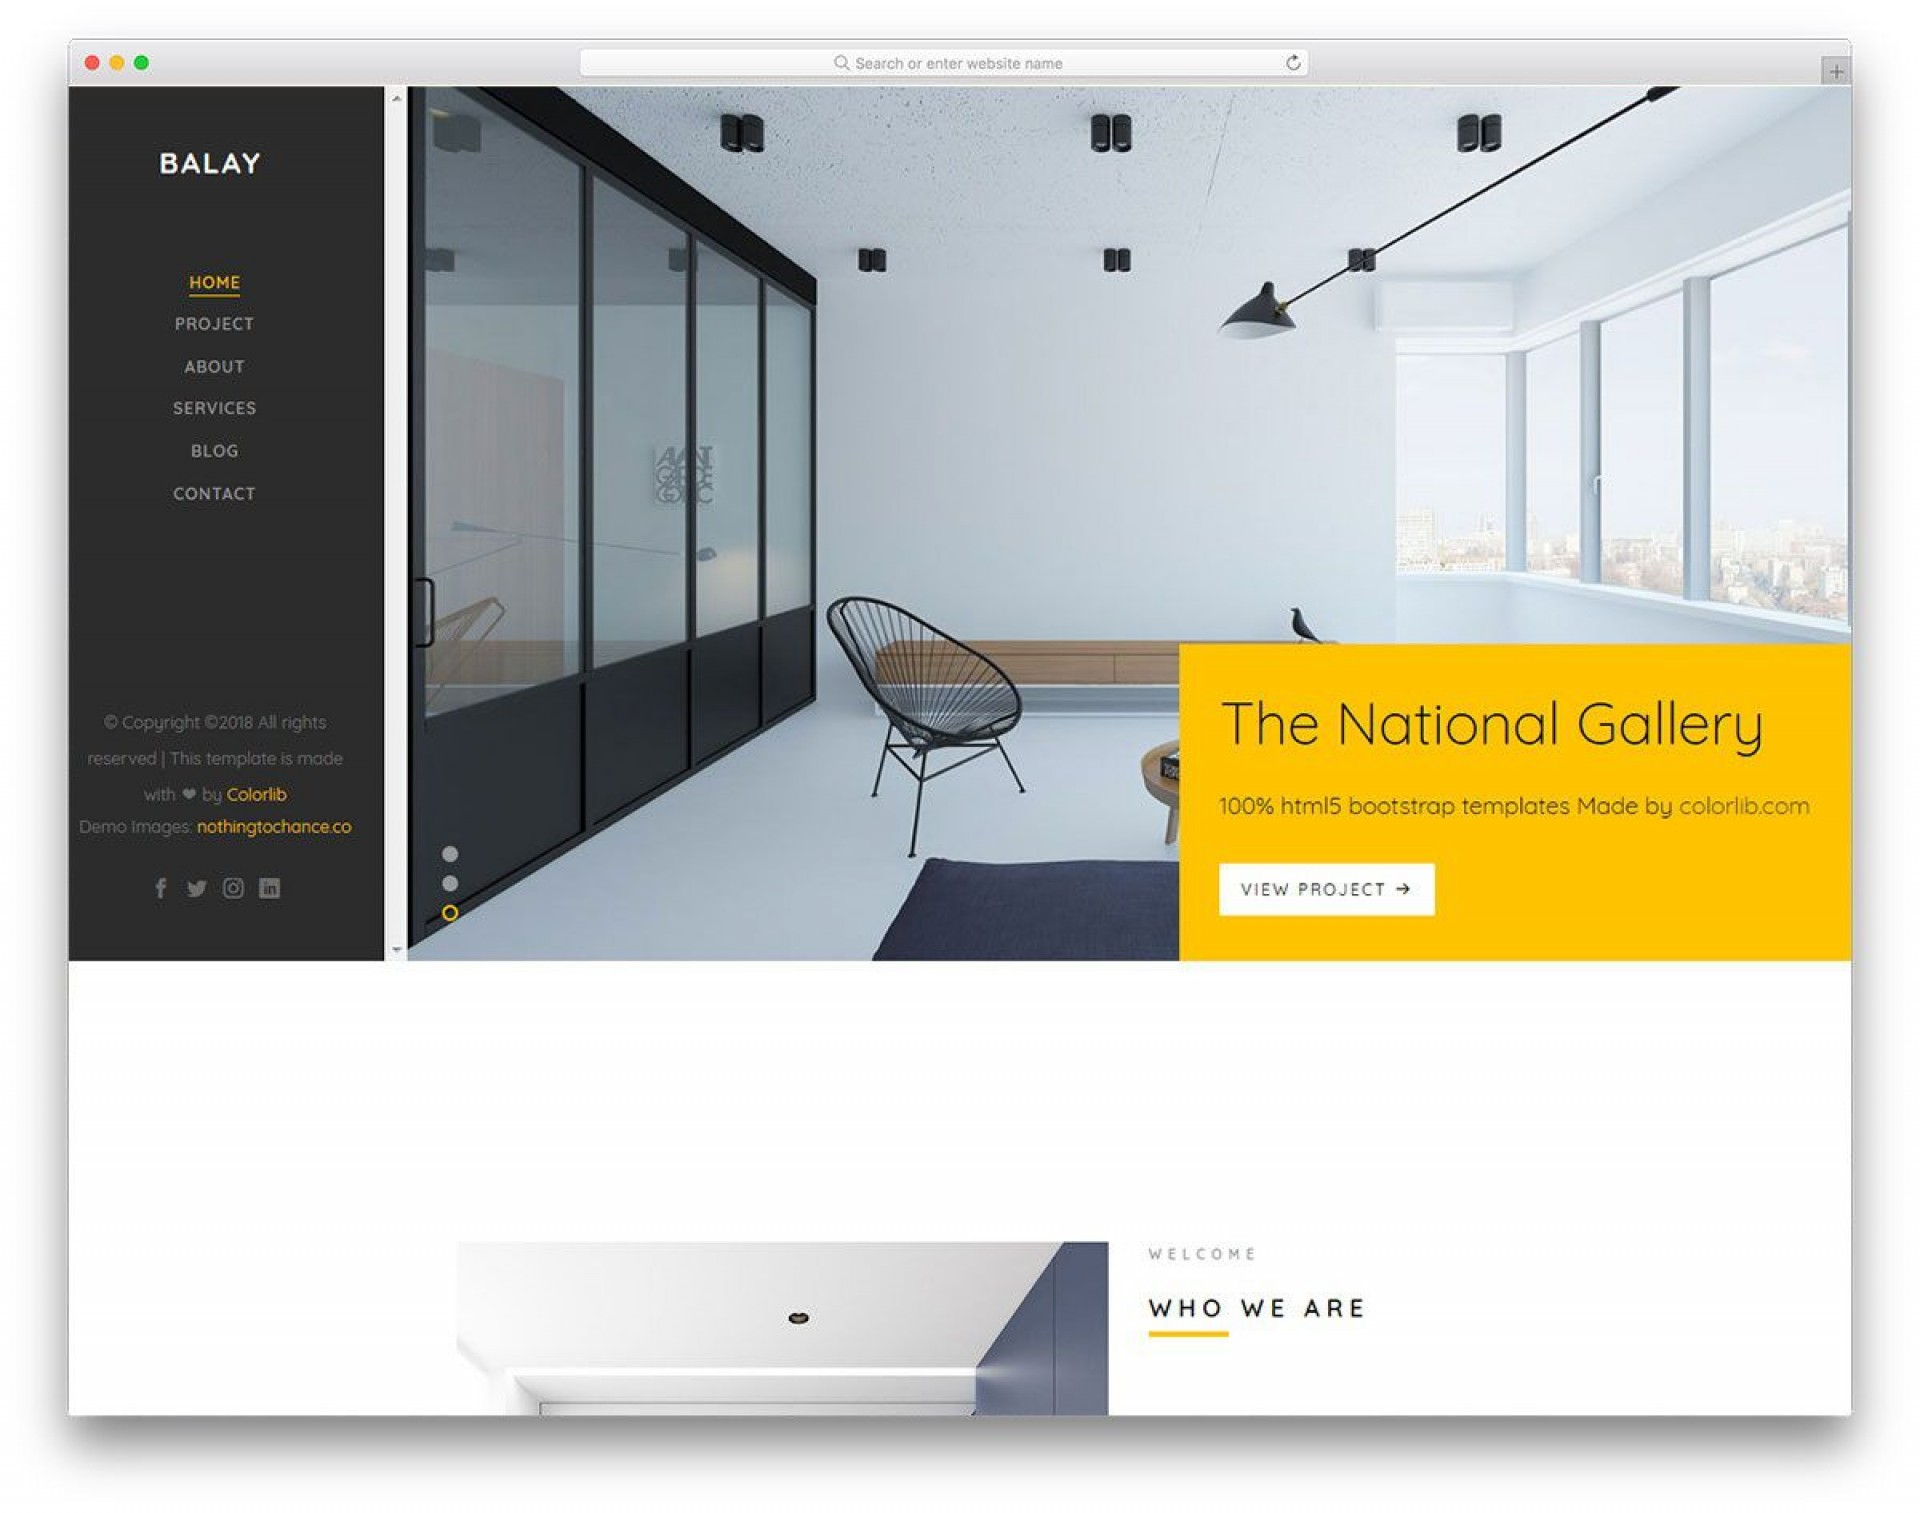 000 Unusual Interior Design Html Template Free Highest Clarity  Download1920